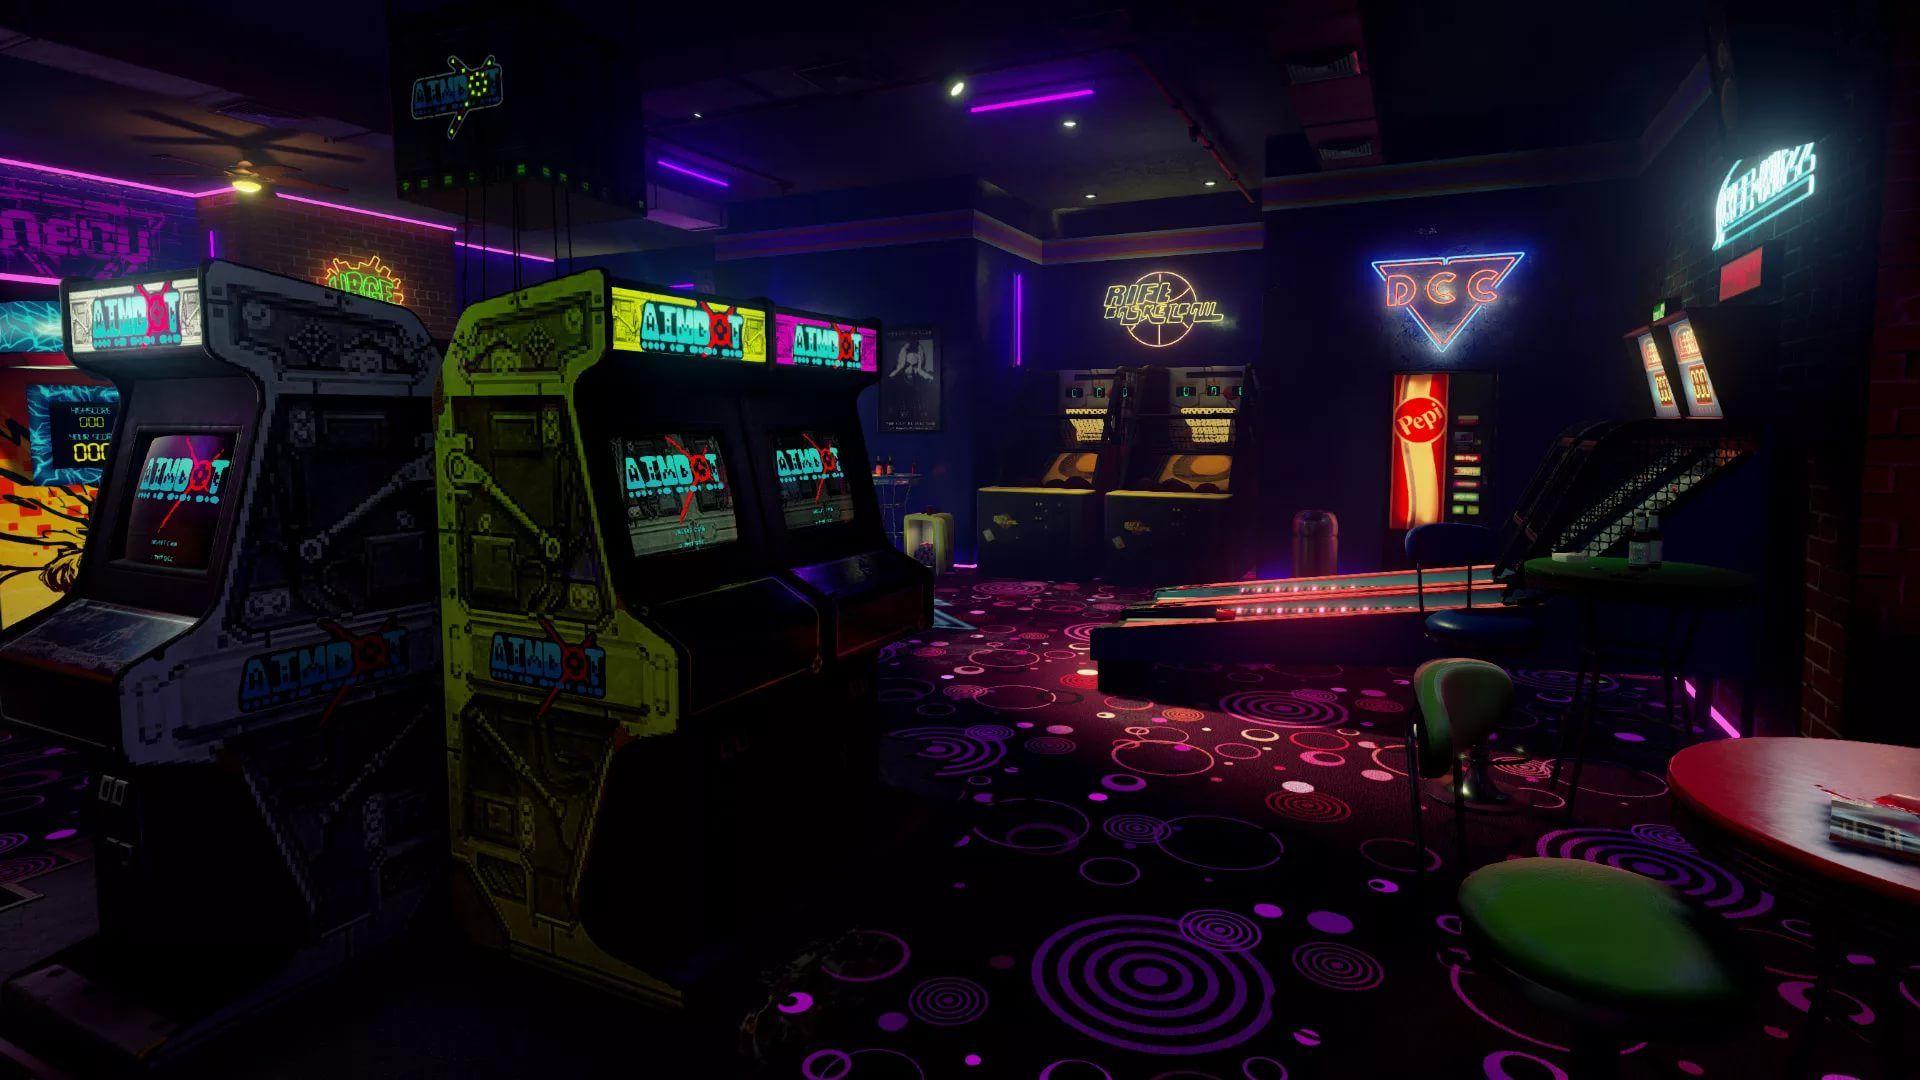 Arcade 1080p Wallpaper